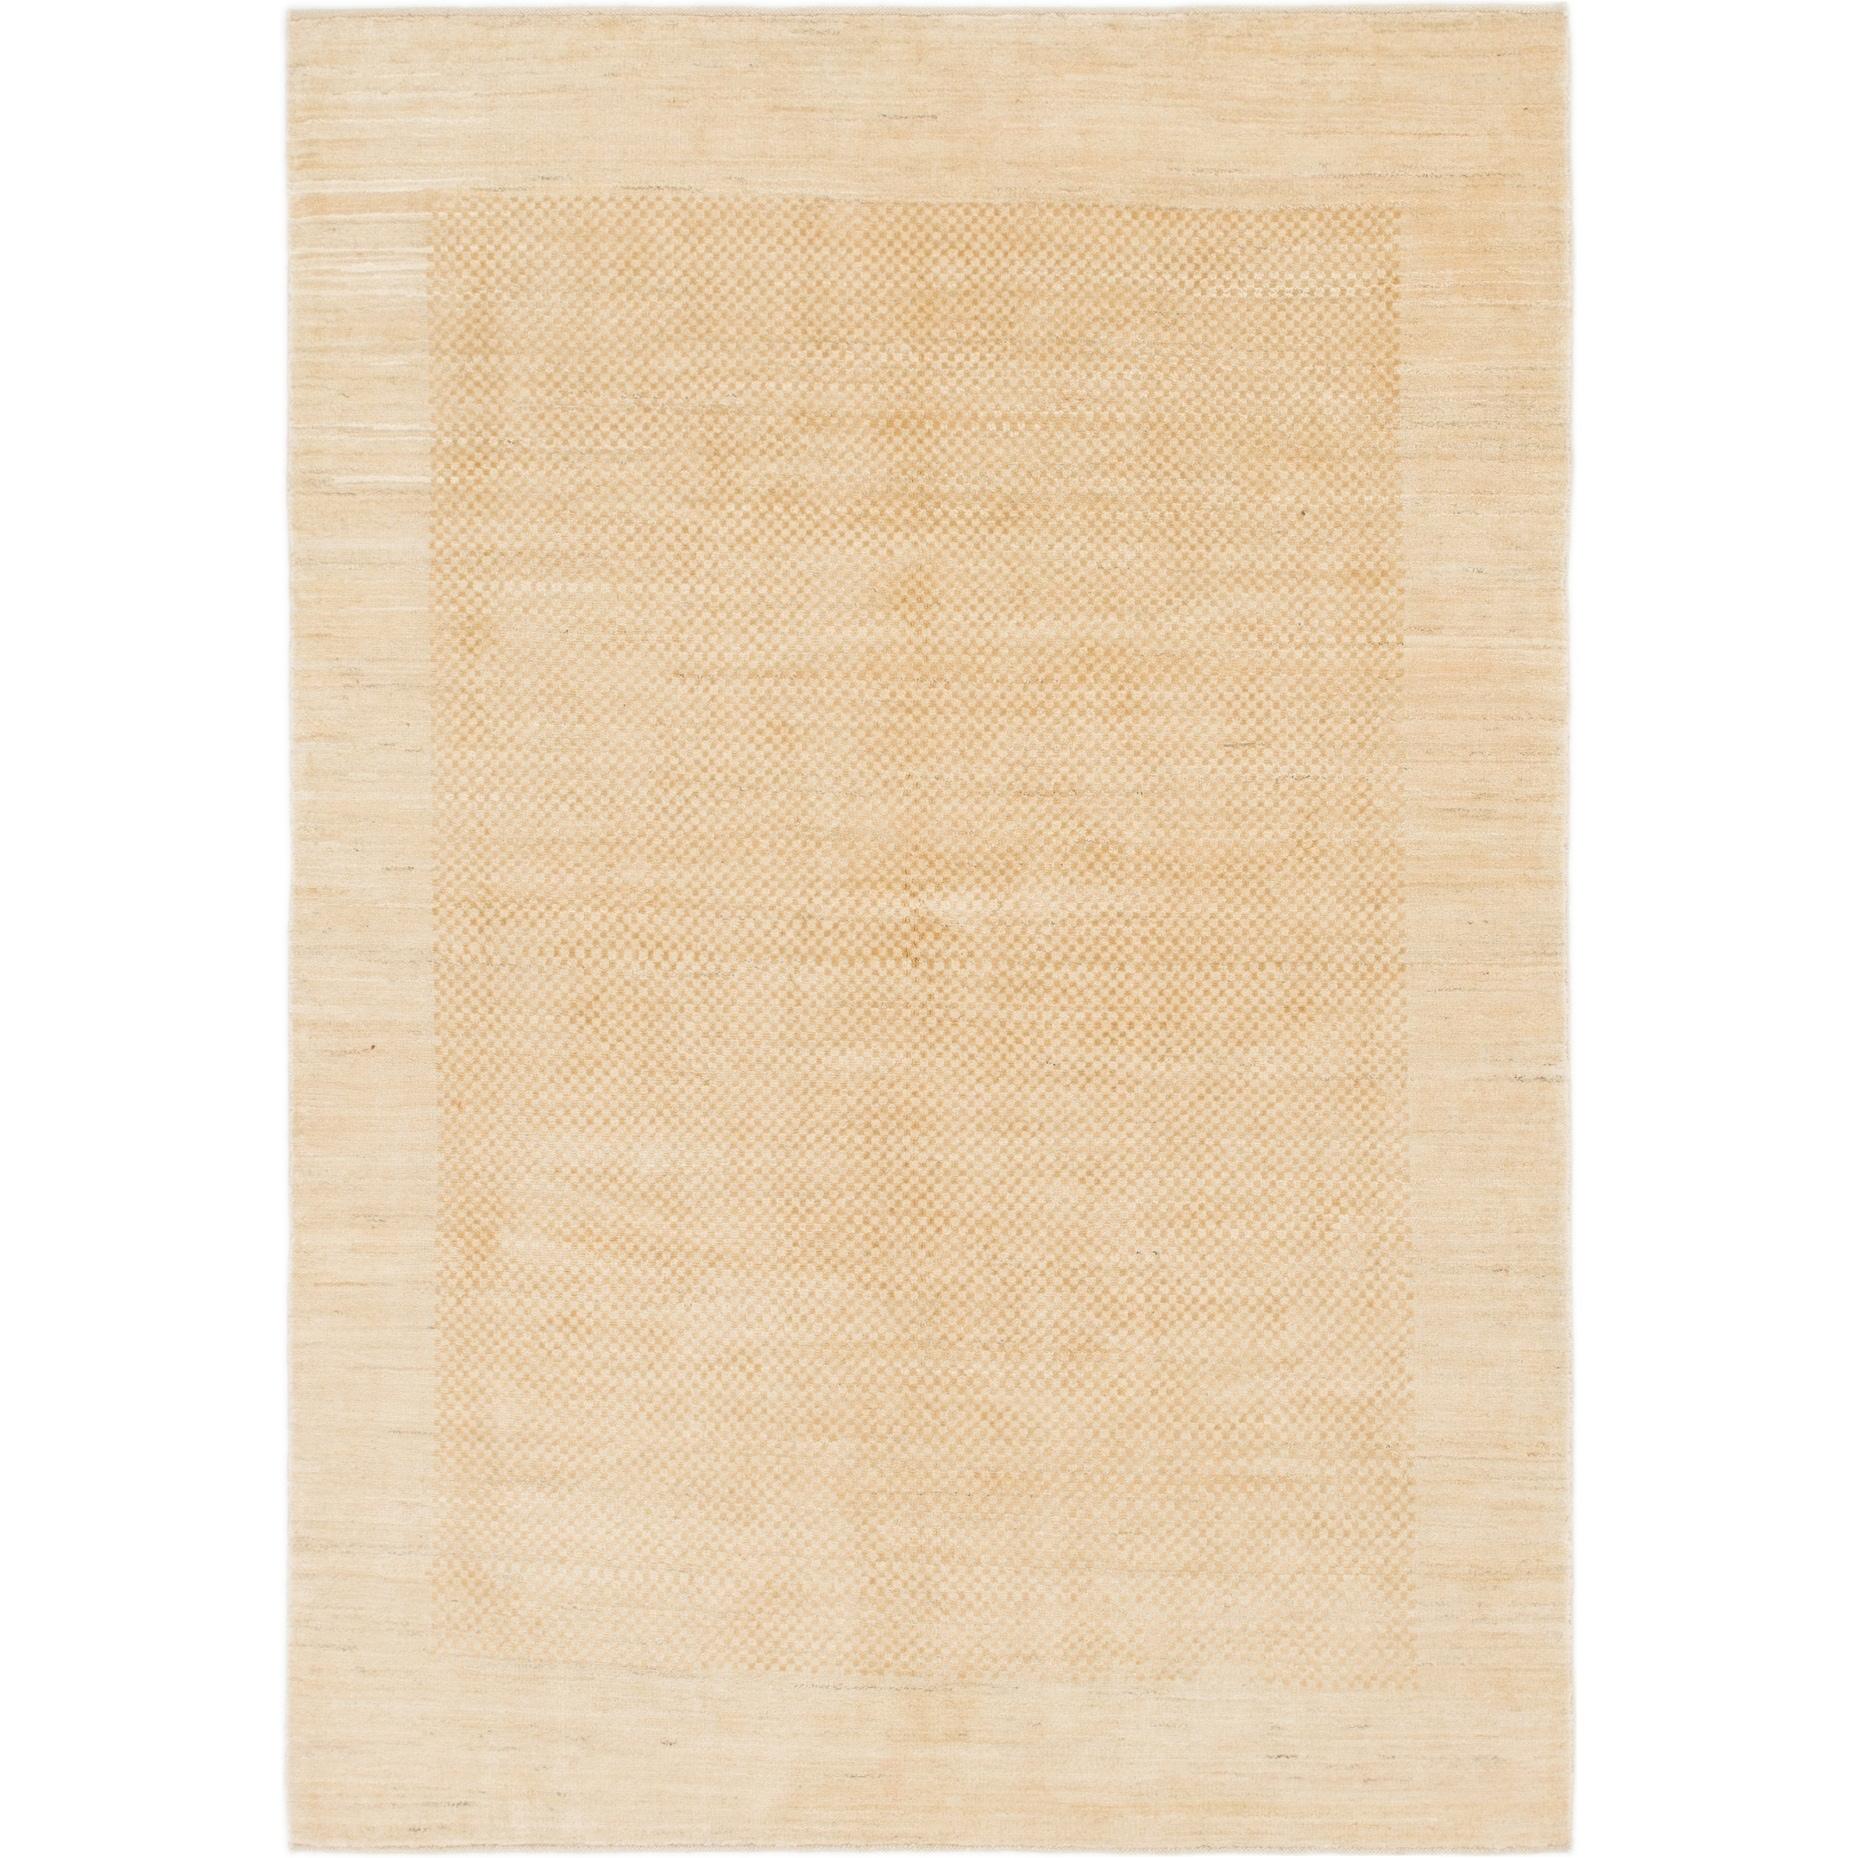 Hand Knotted Kashkuli Gabbeh Wool Area Rug - 5 7 x 8 (Gold - 5 7 x 8)